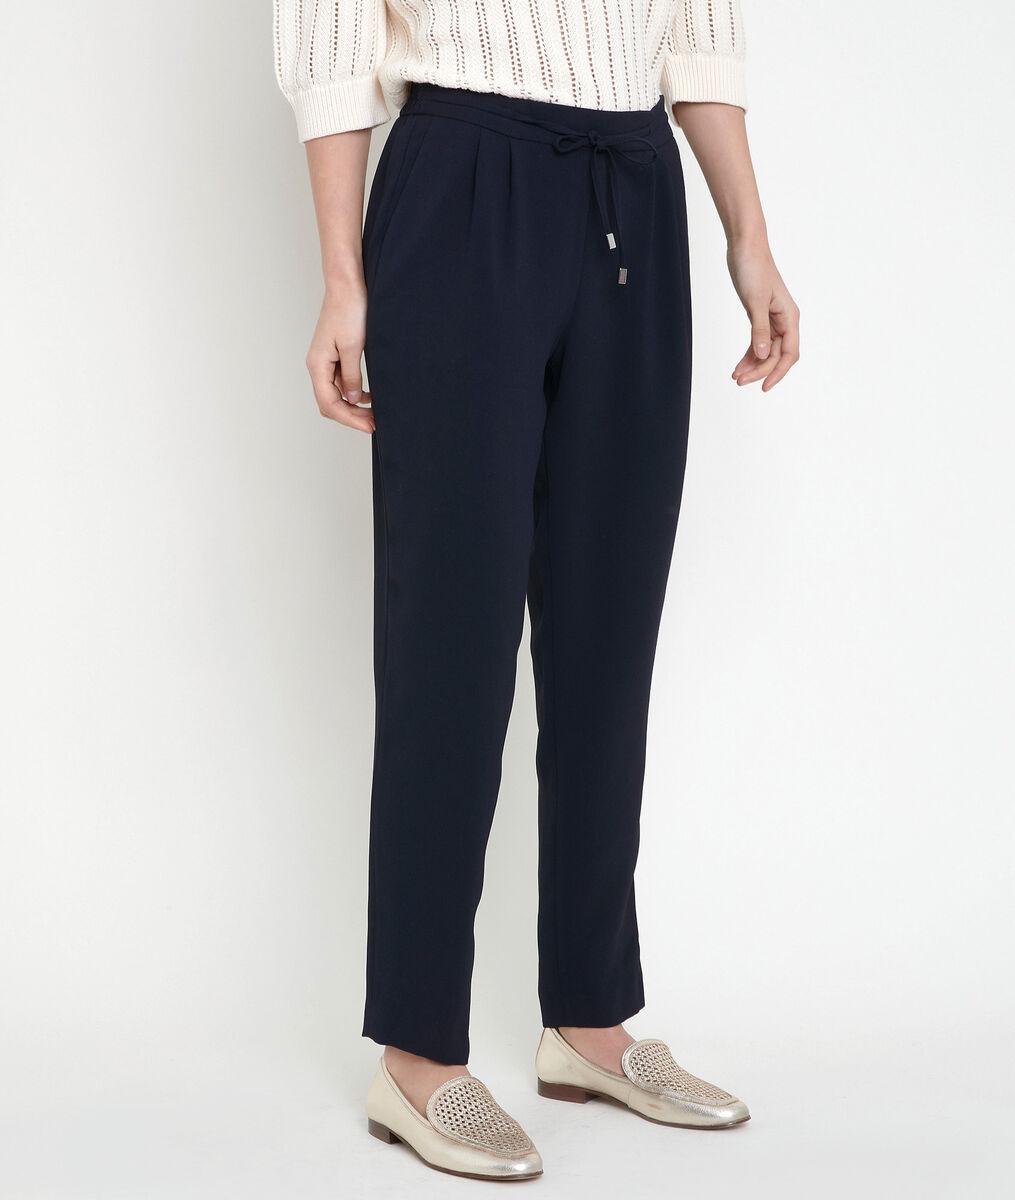 FLYNN navy crepe carrot-cut trousers PhotoZ | 1-2-3